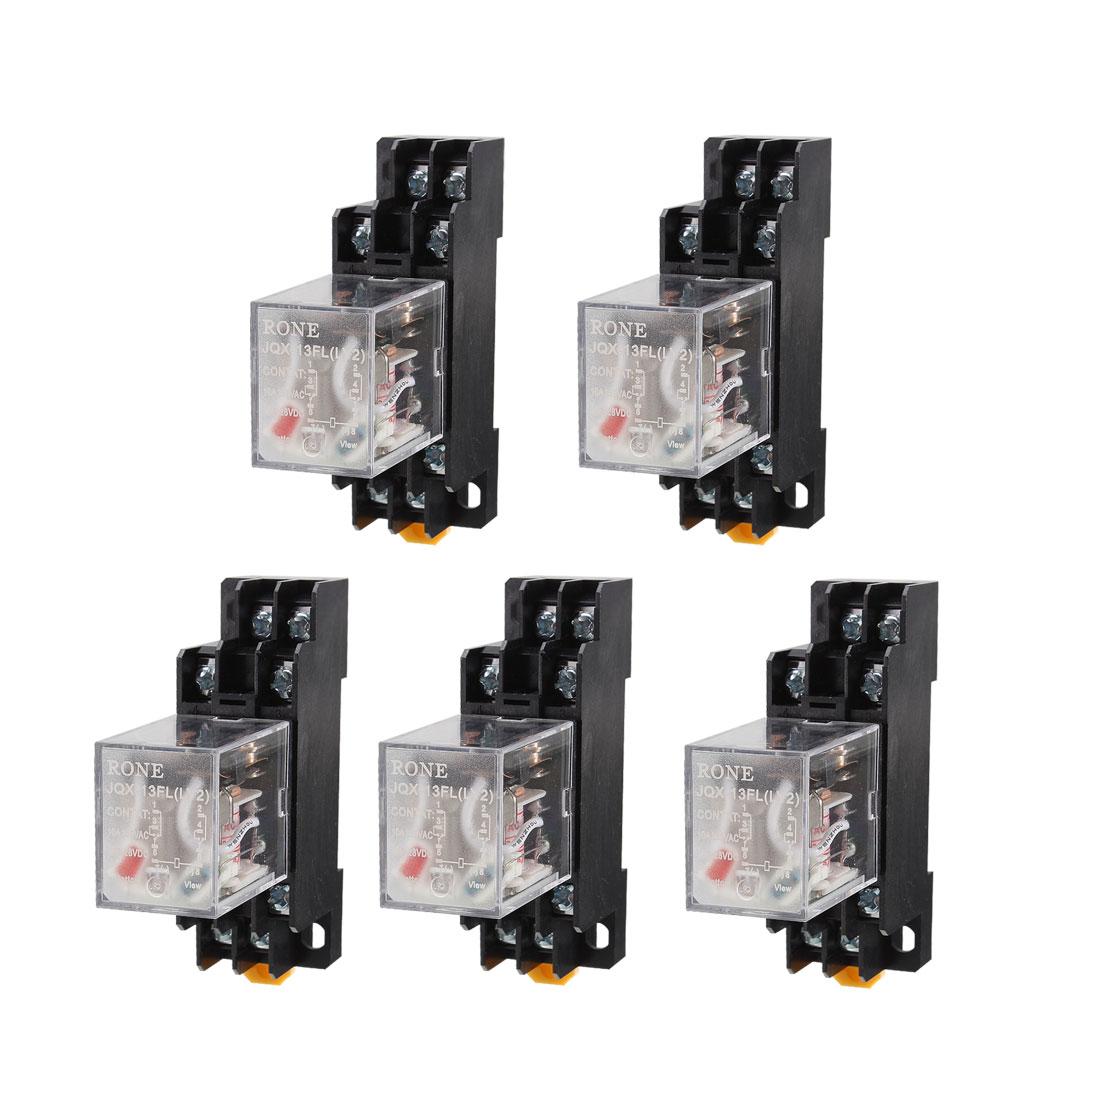 5 Pcs AC 220V-240V DPDT 8 Pins Red LED General Purpose Power Relay w Socket Base